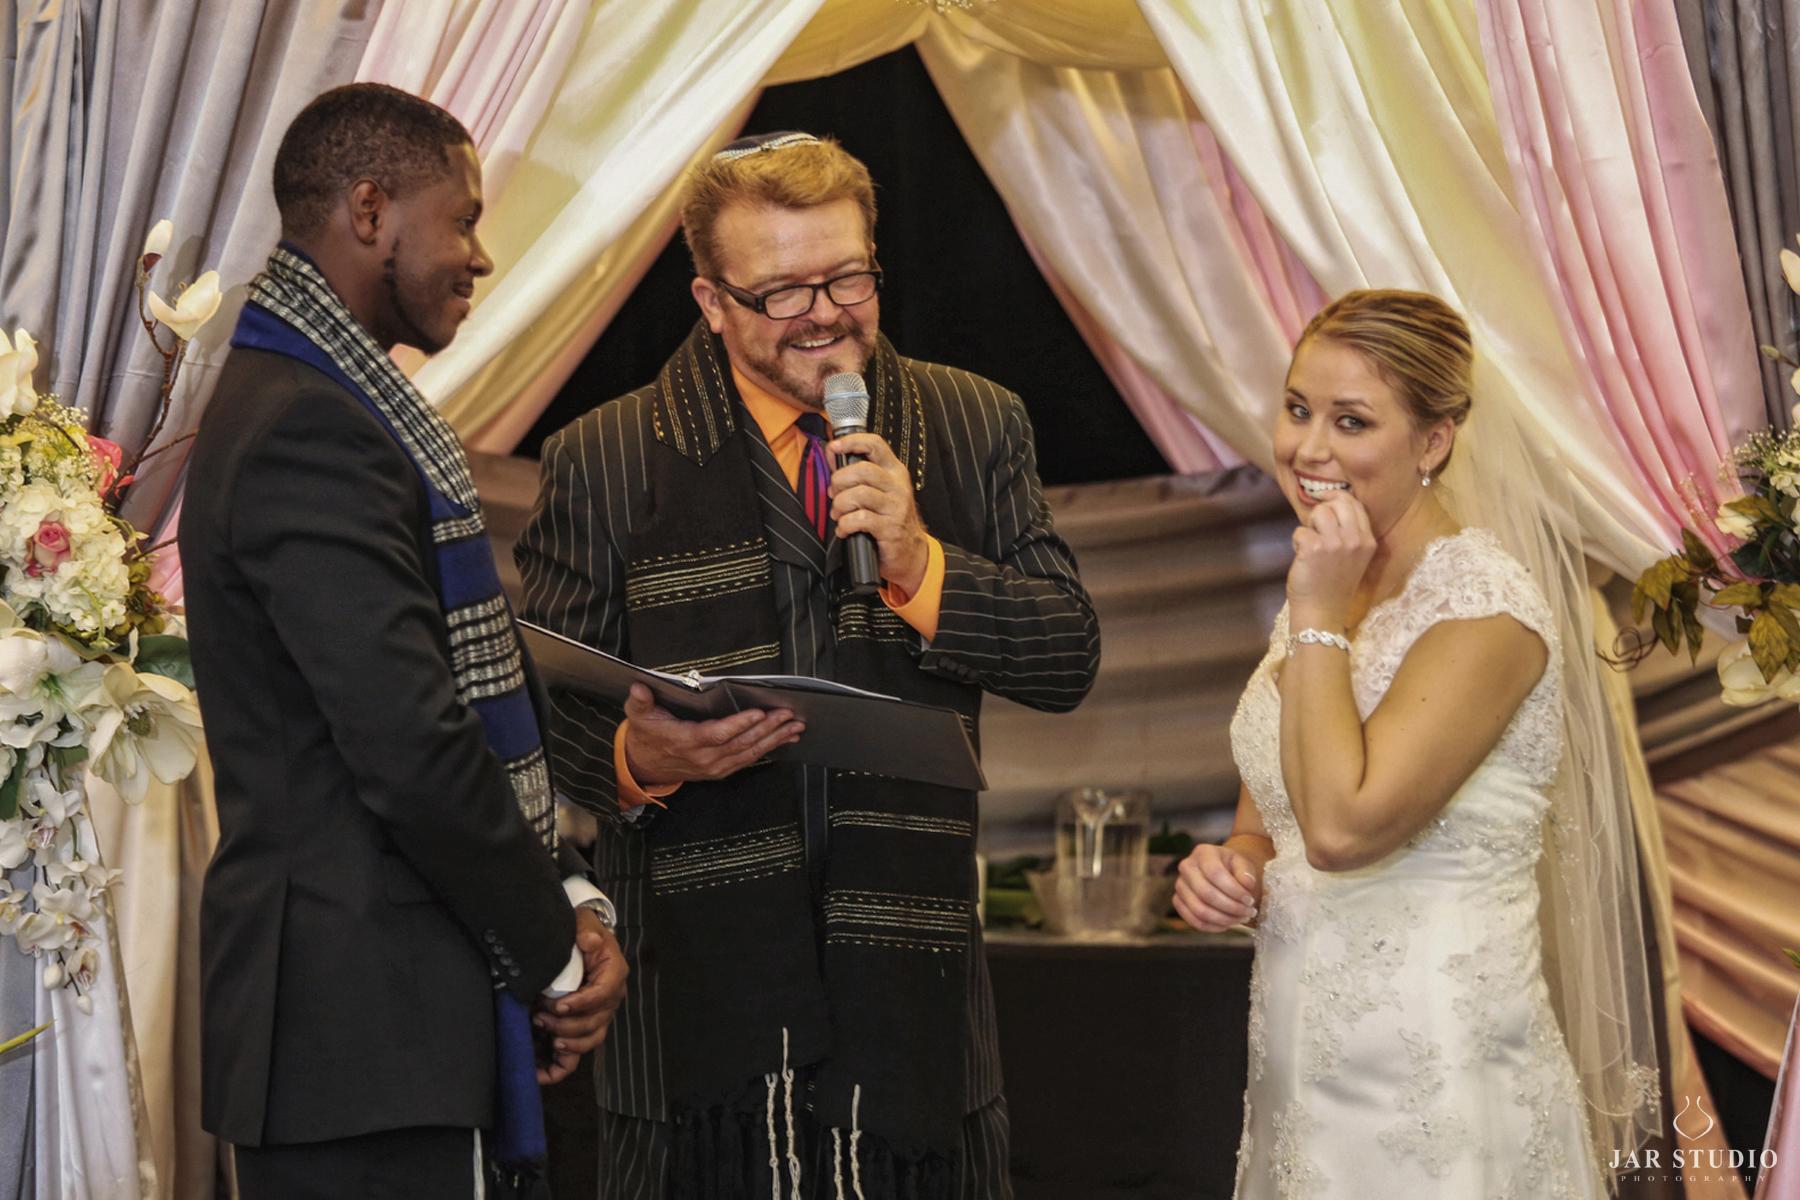 15-best-rabbi-wedding-ceremony-jarstudio-photography.jpg